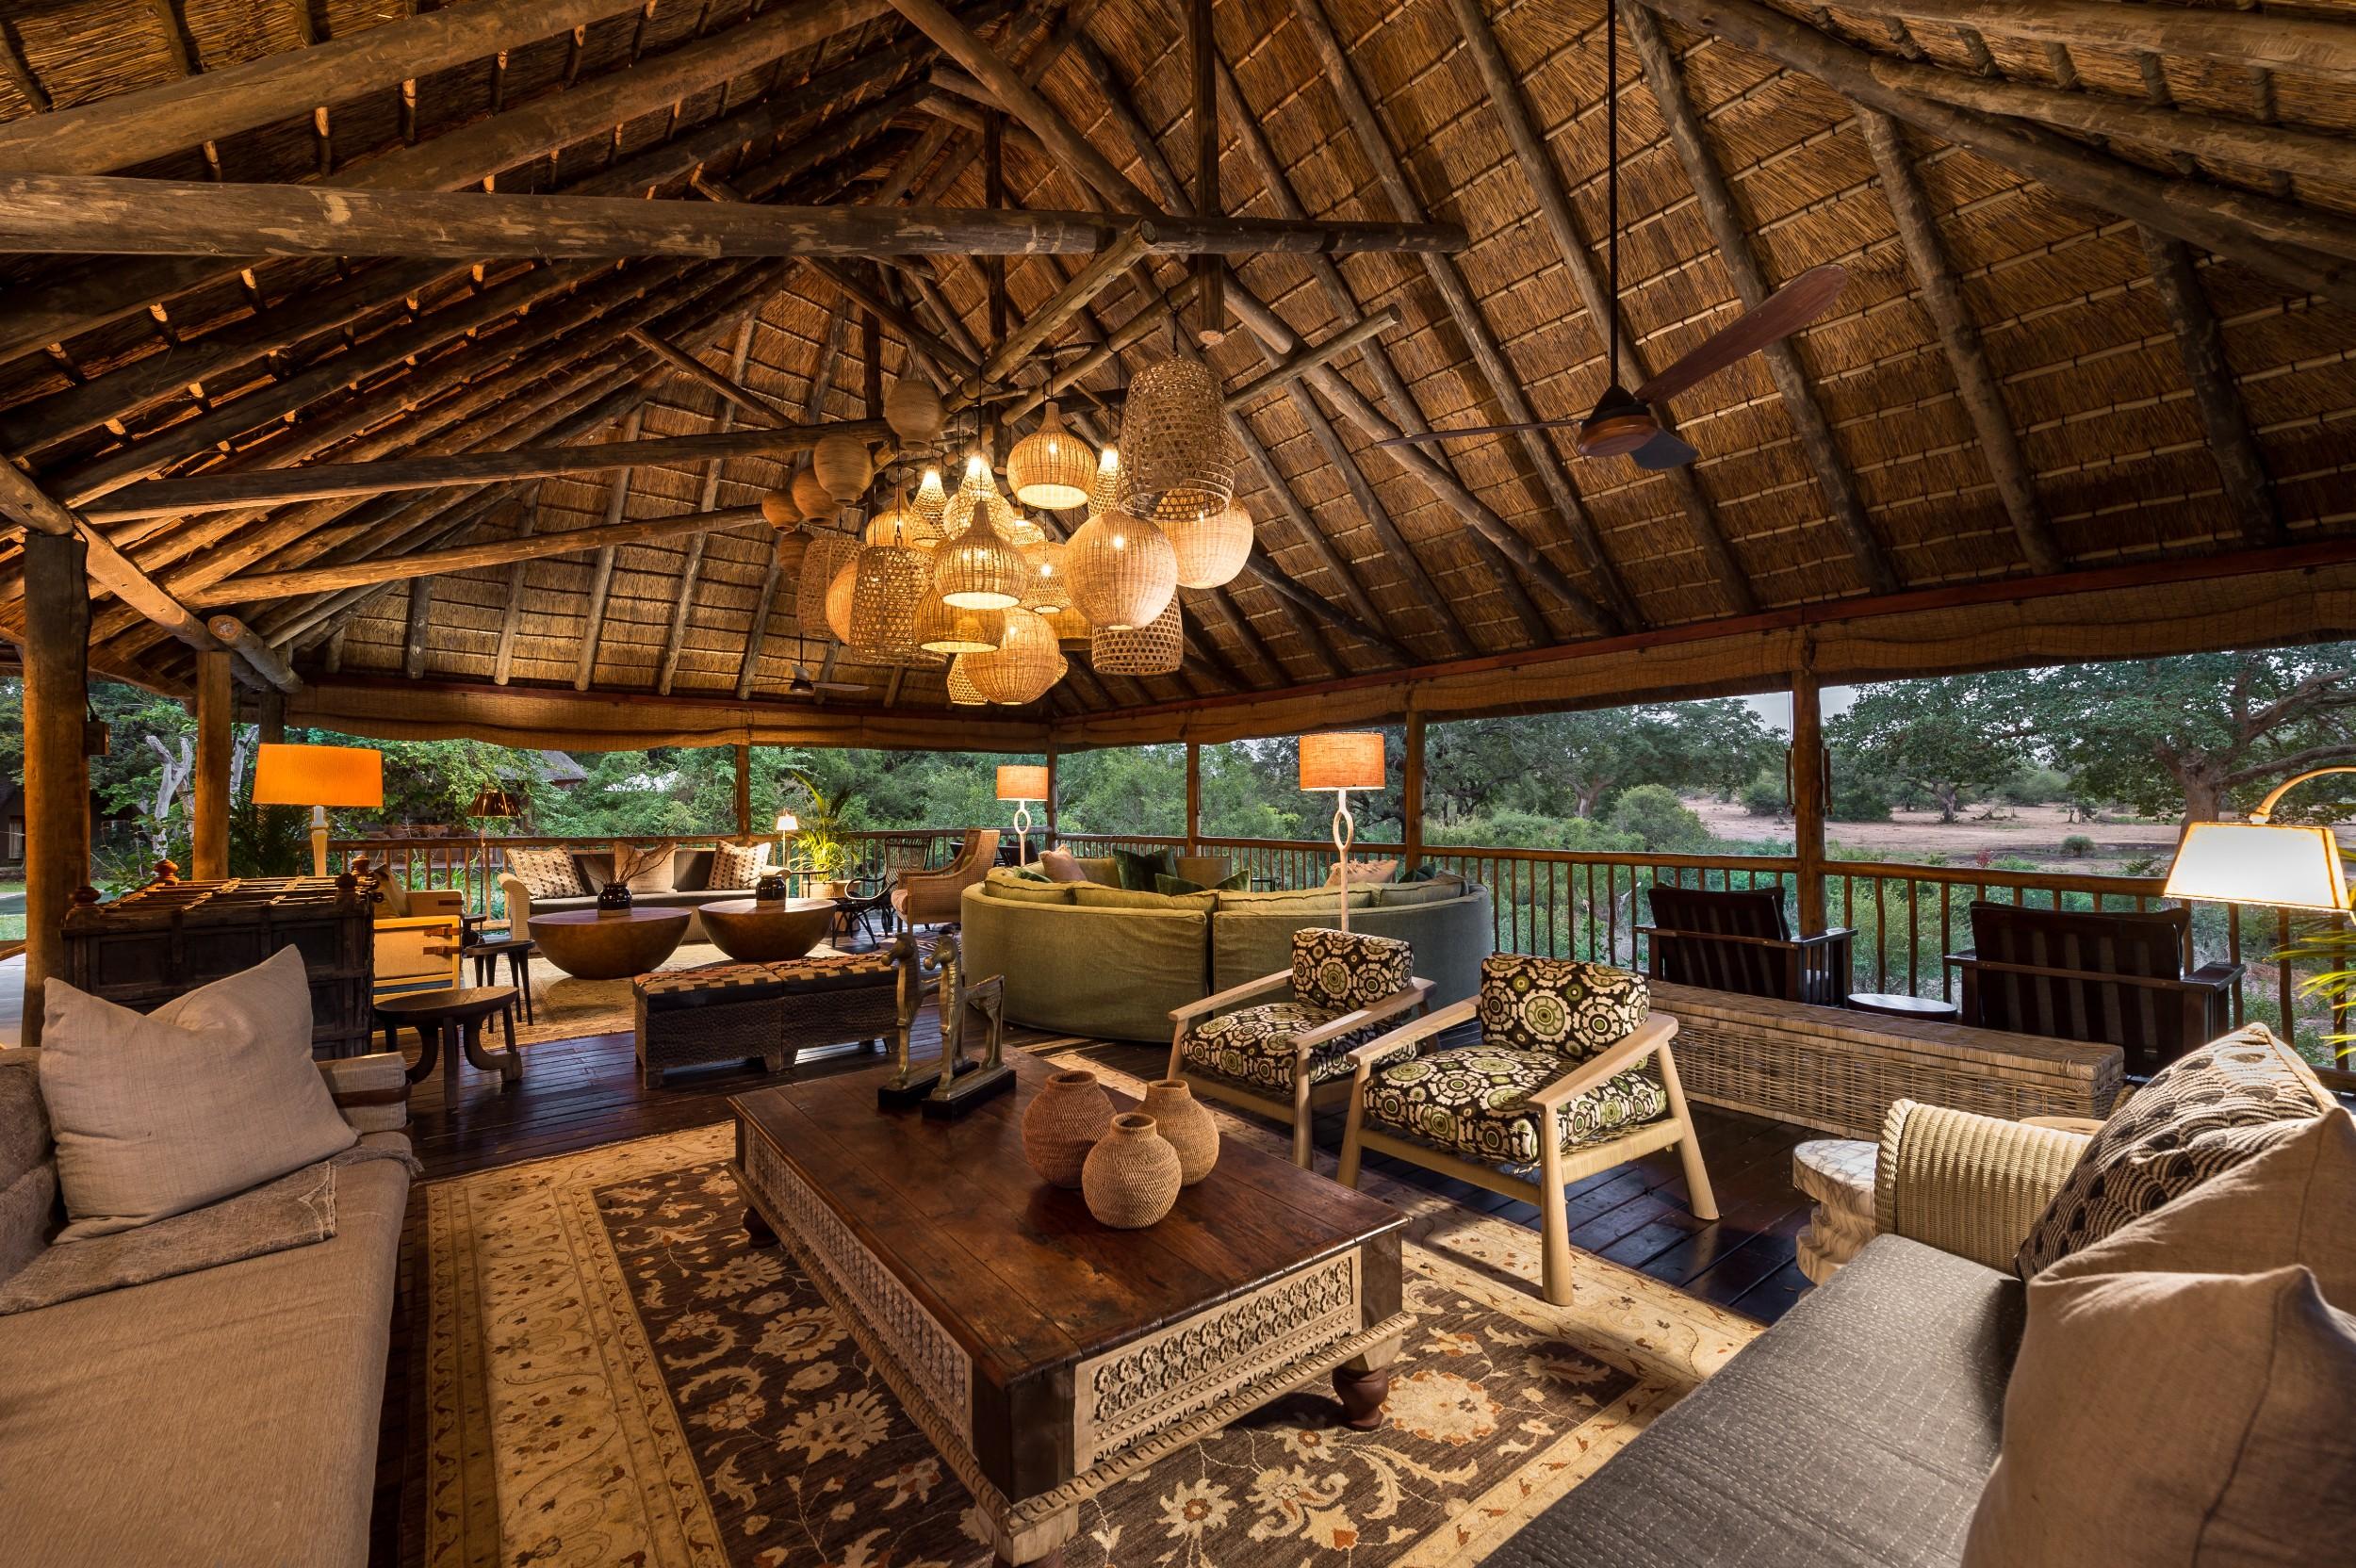 safari_deck-2.jpg